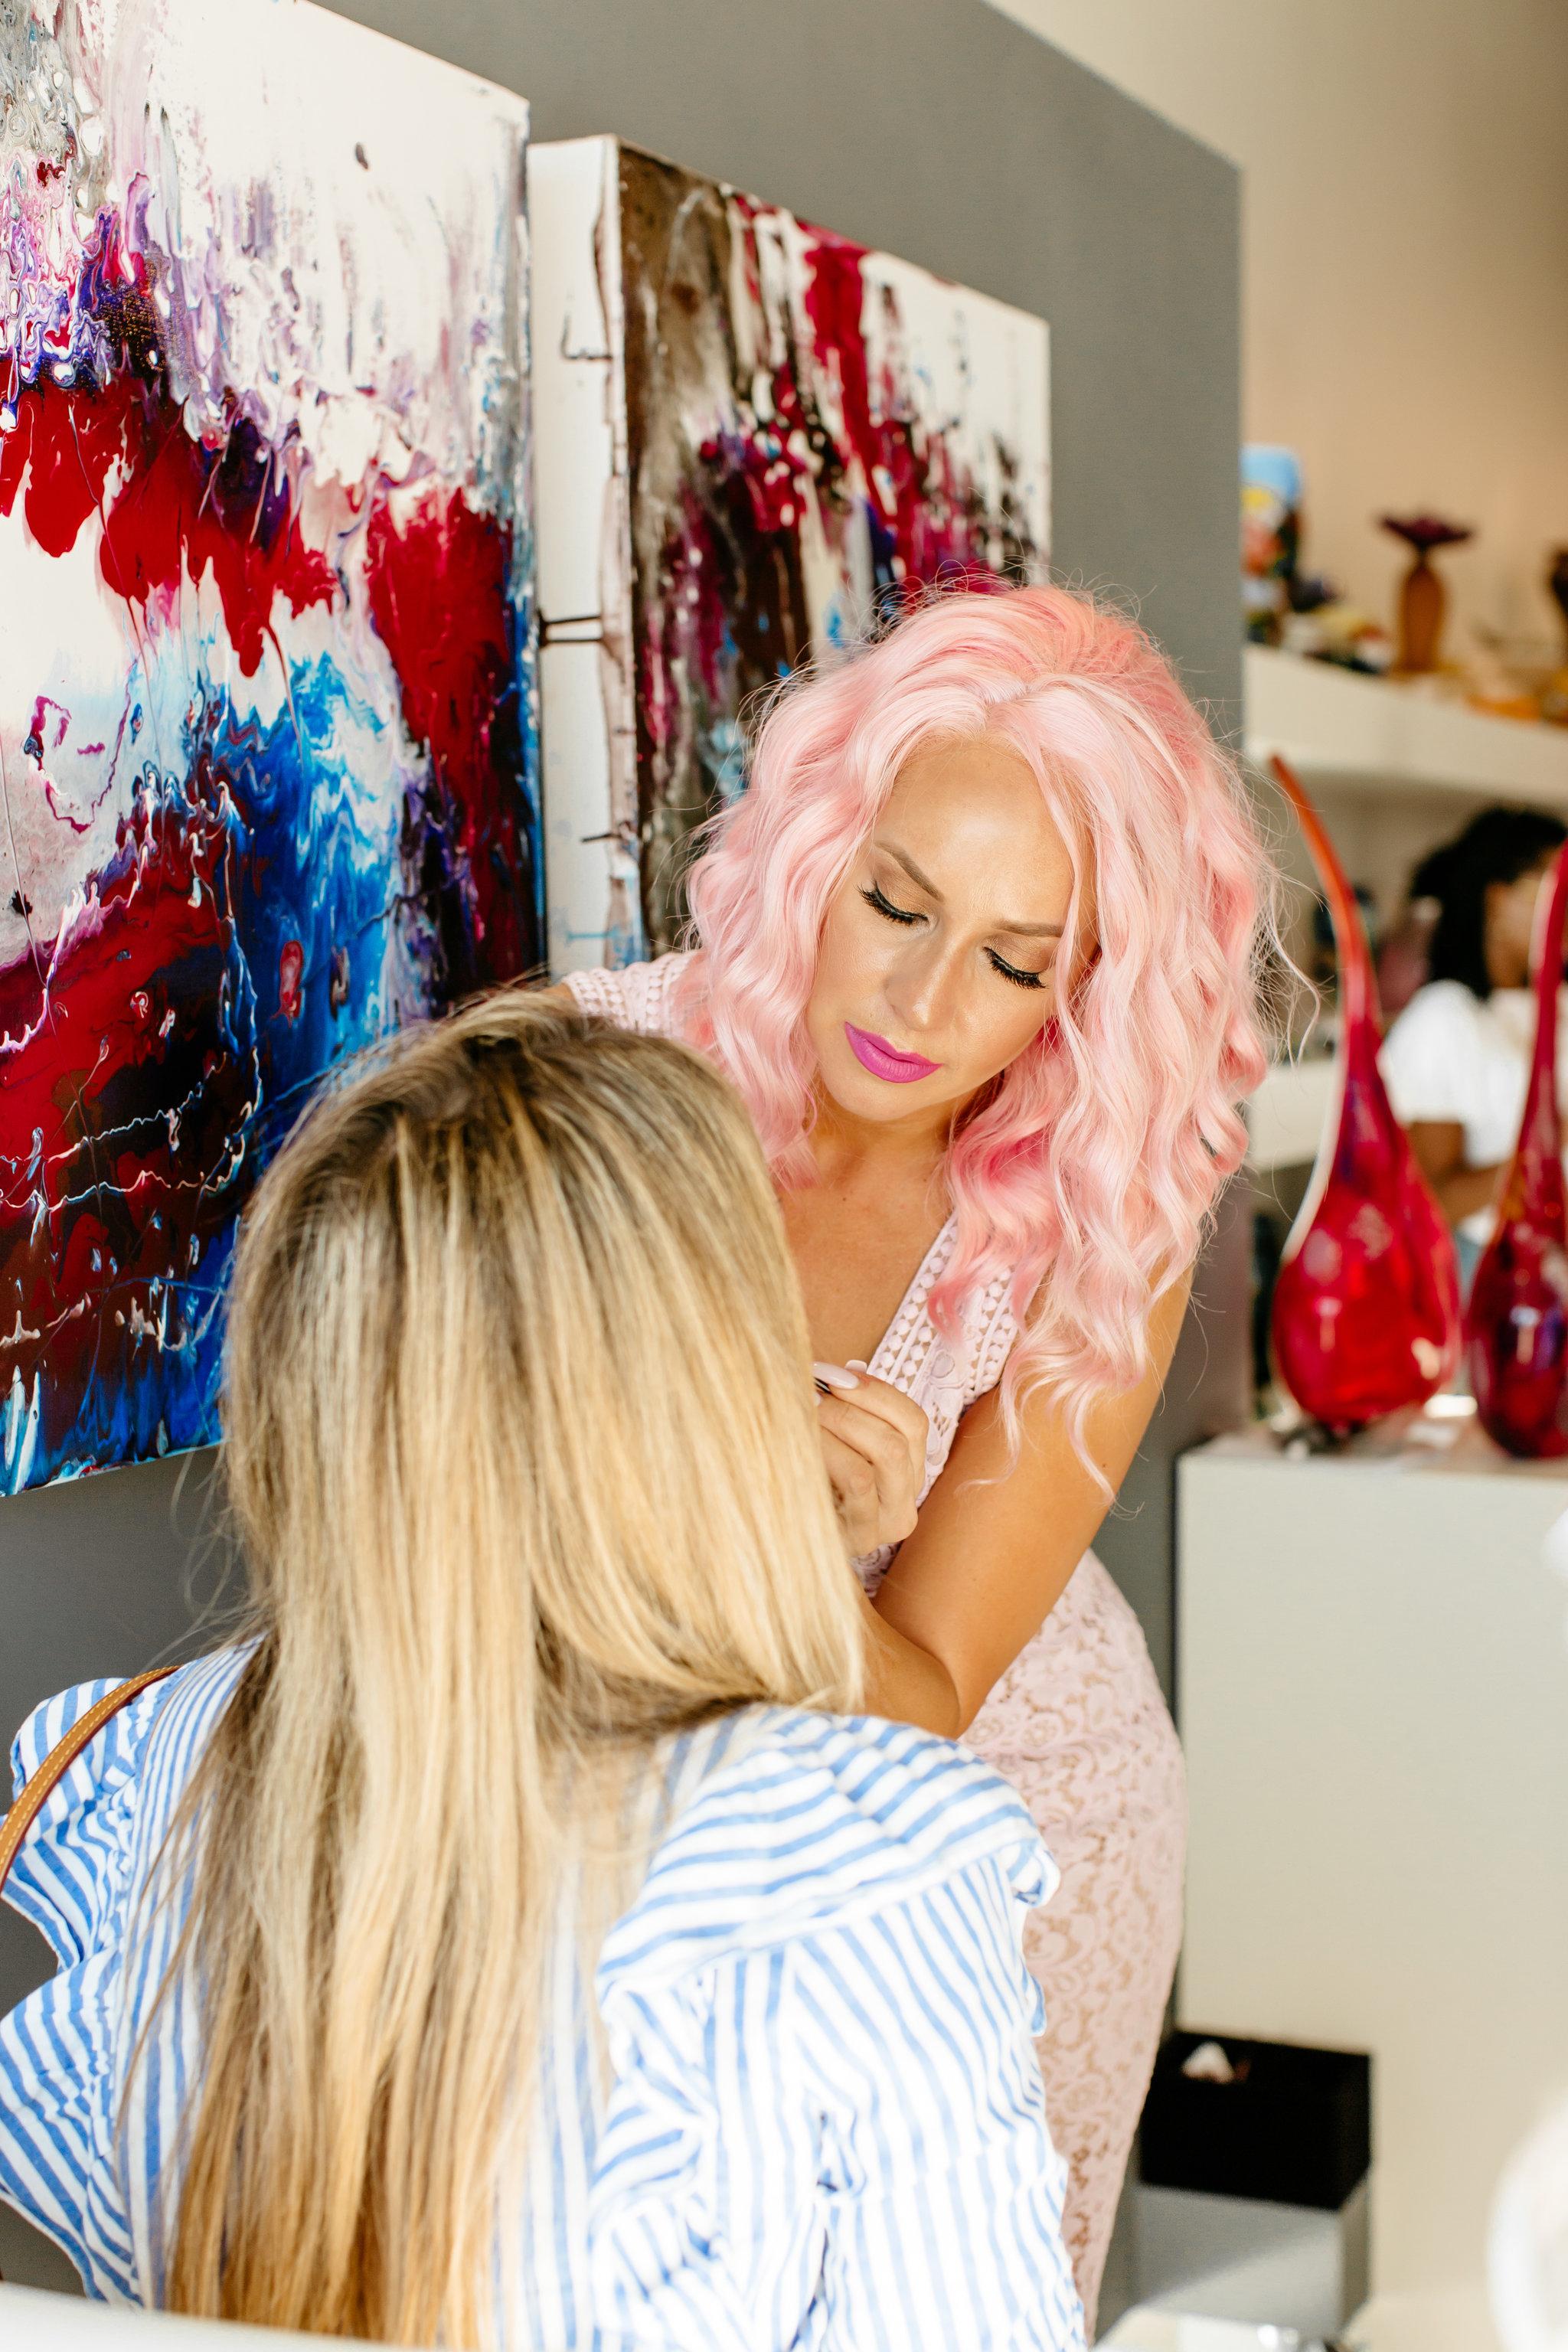 Alexa-Vossler-Photo_Dallas-Event-Photographer_Brite-Bar-Beauty-2018-Lipstick-Launch-Party-14.jpg